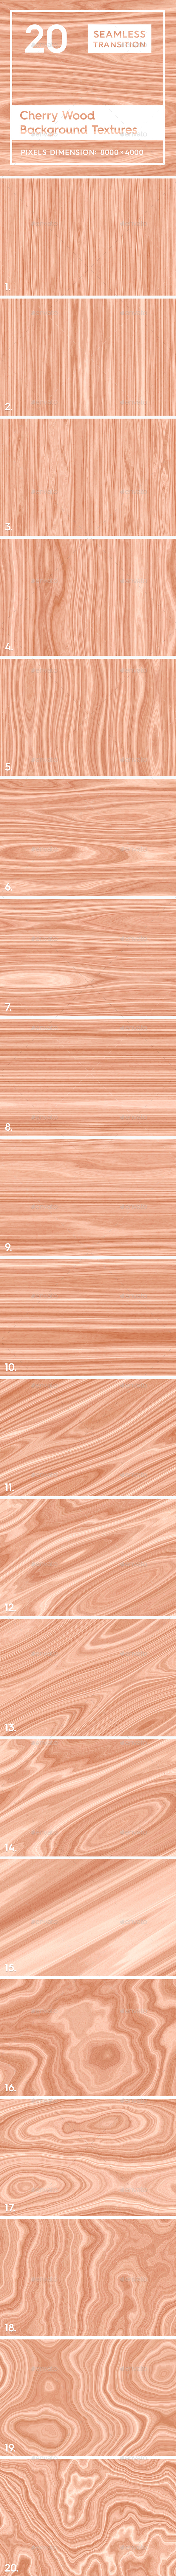 20 Cherry Wood Background Textures - Wood Textures